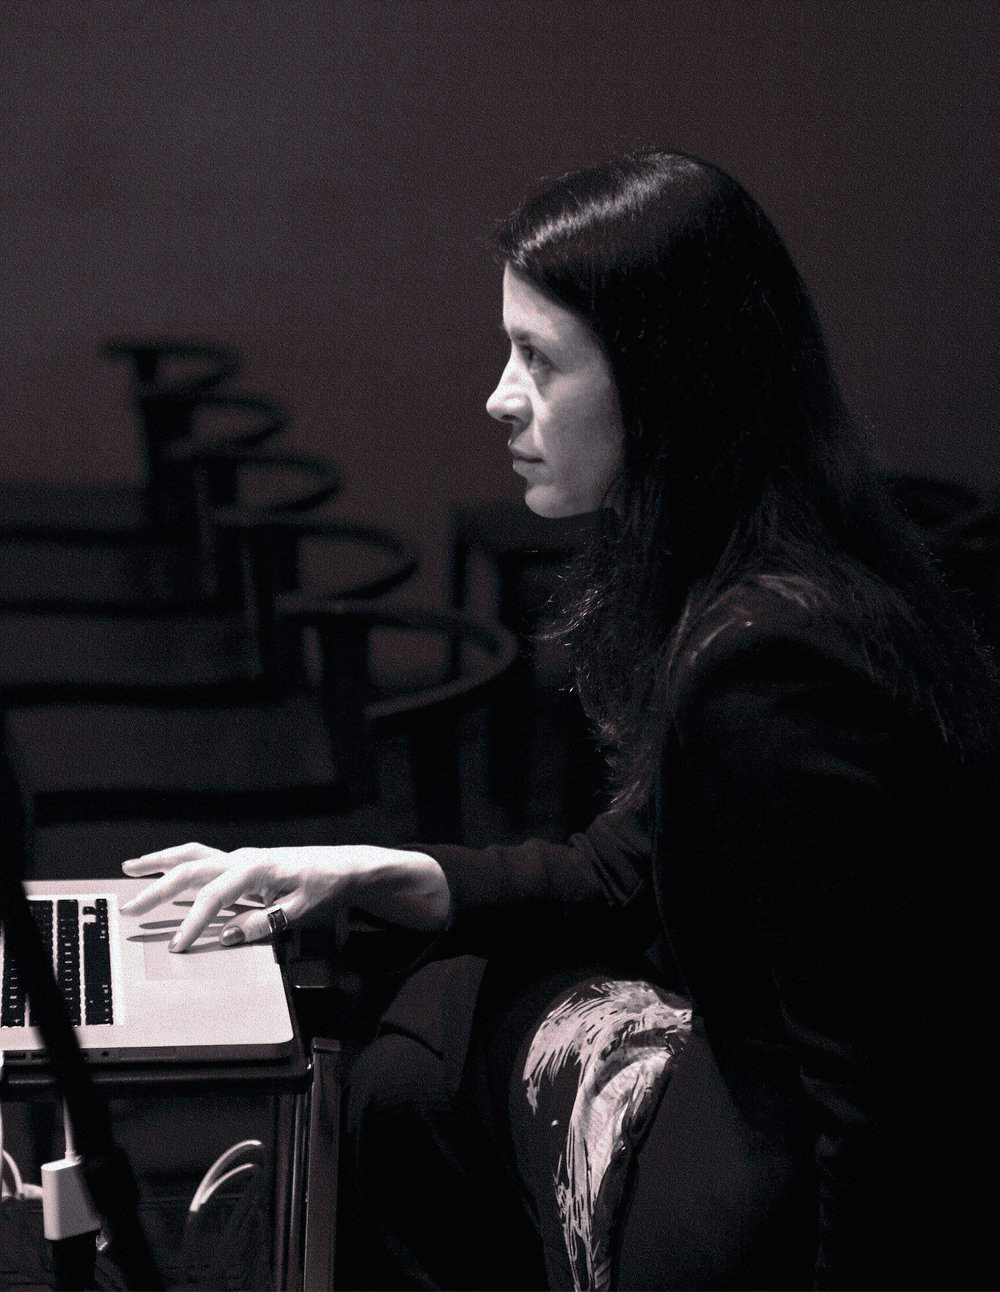 - Elaine at Sonorium Hall, Tokyo, Japan. 2012